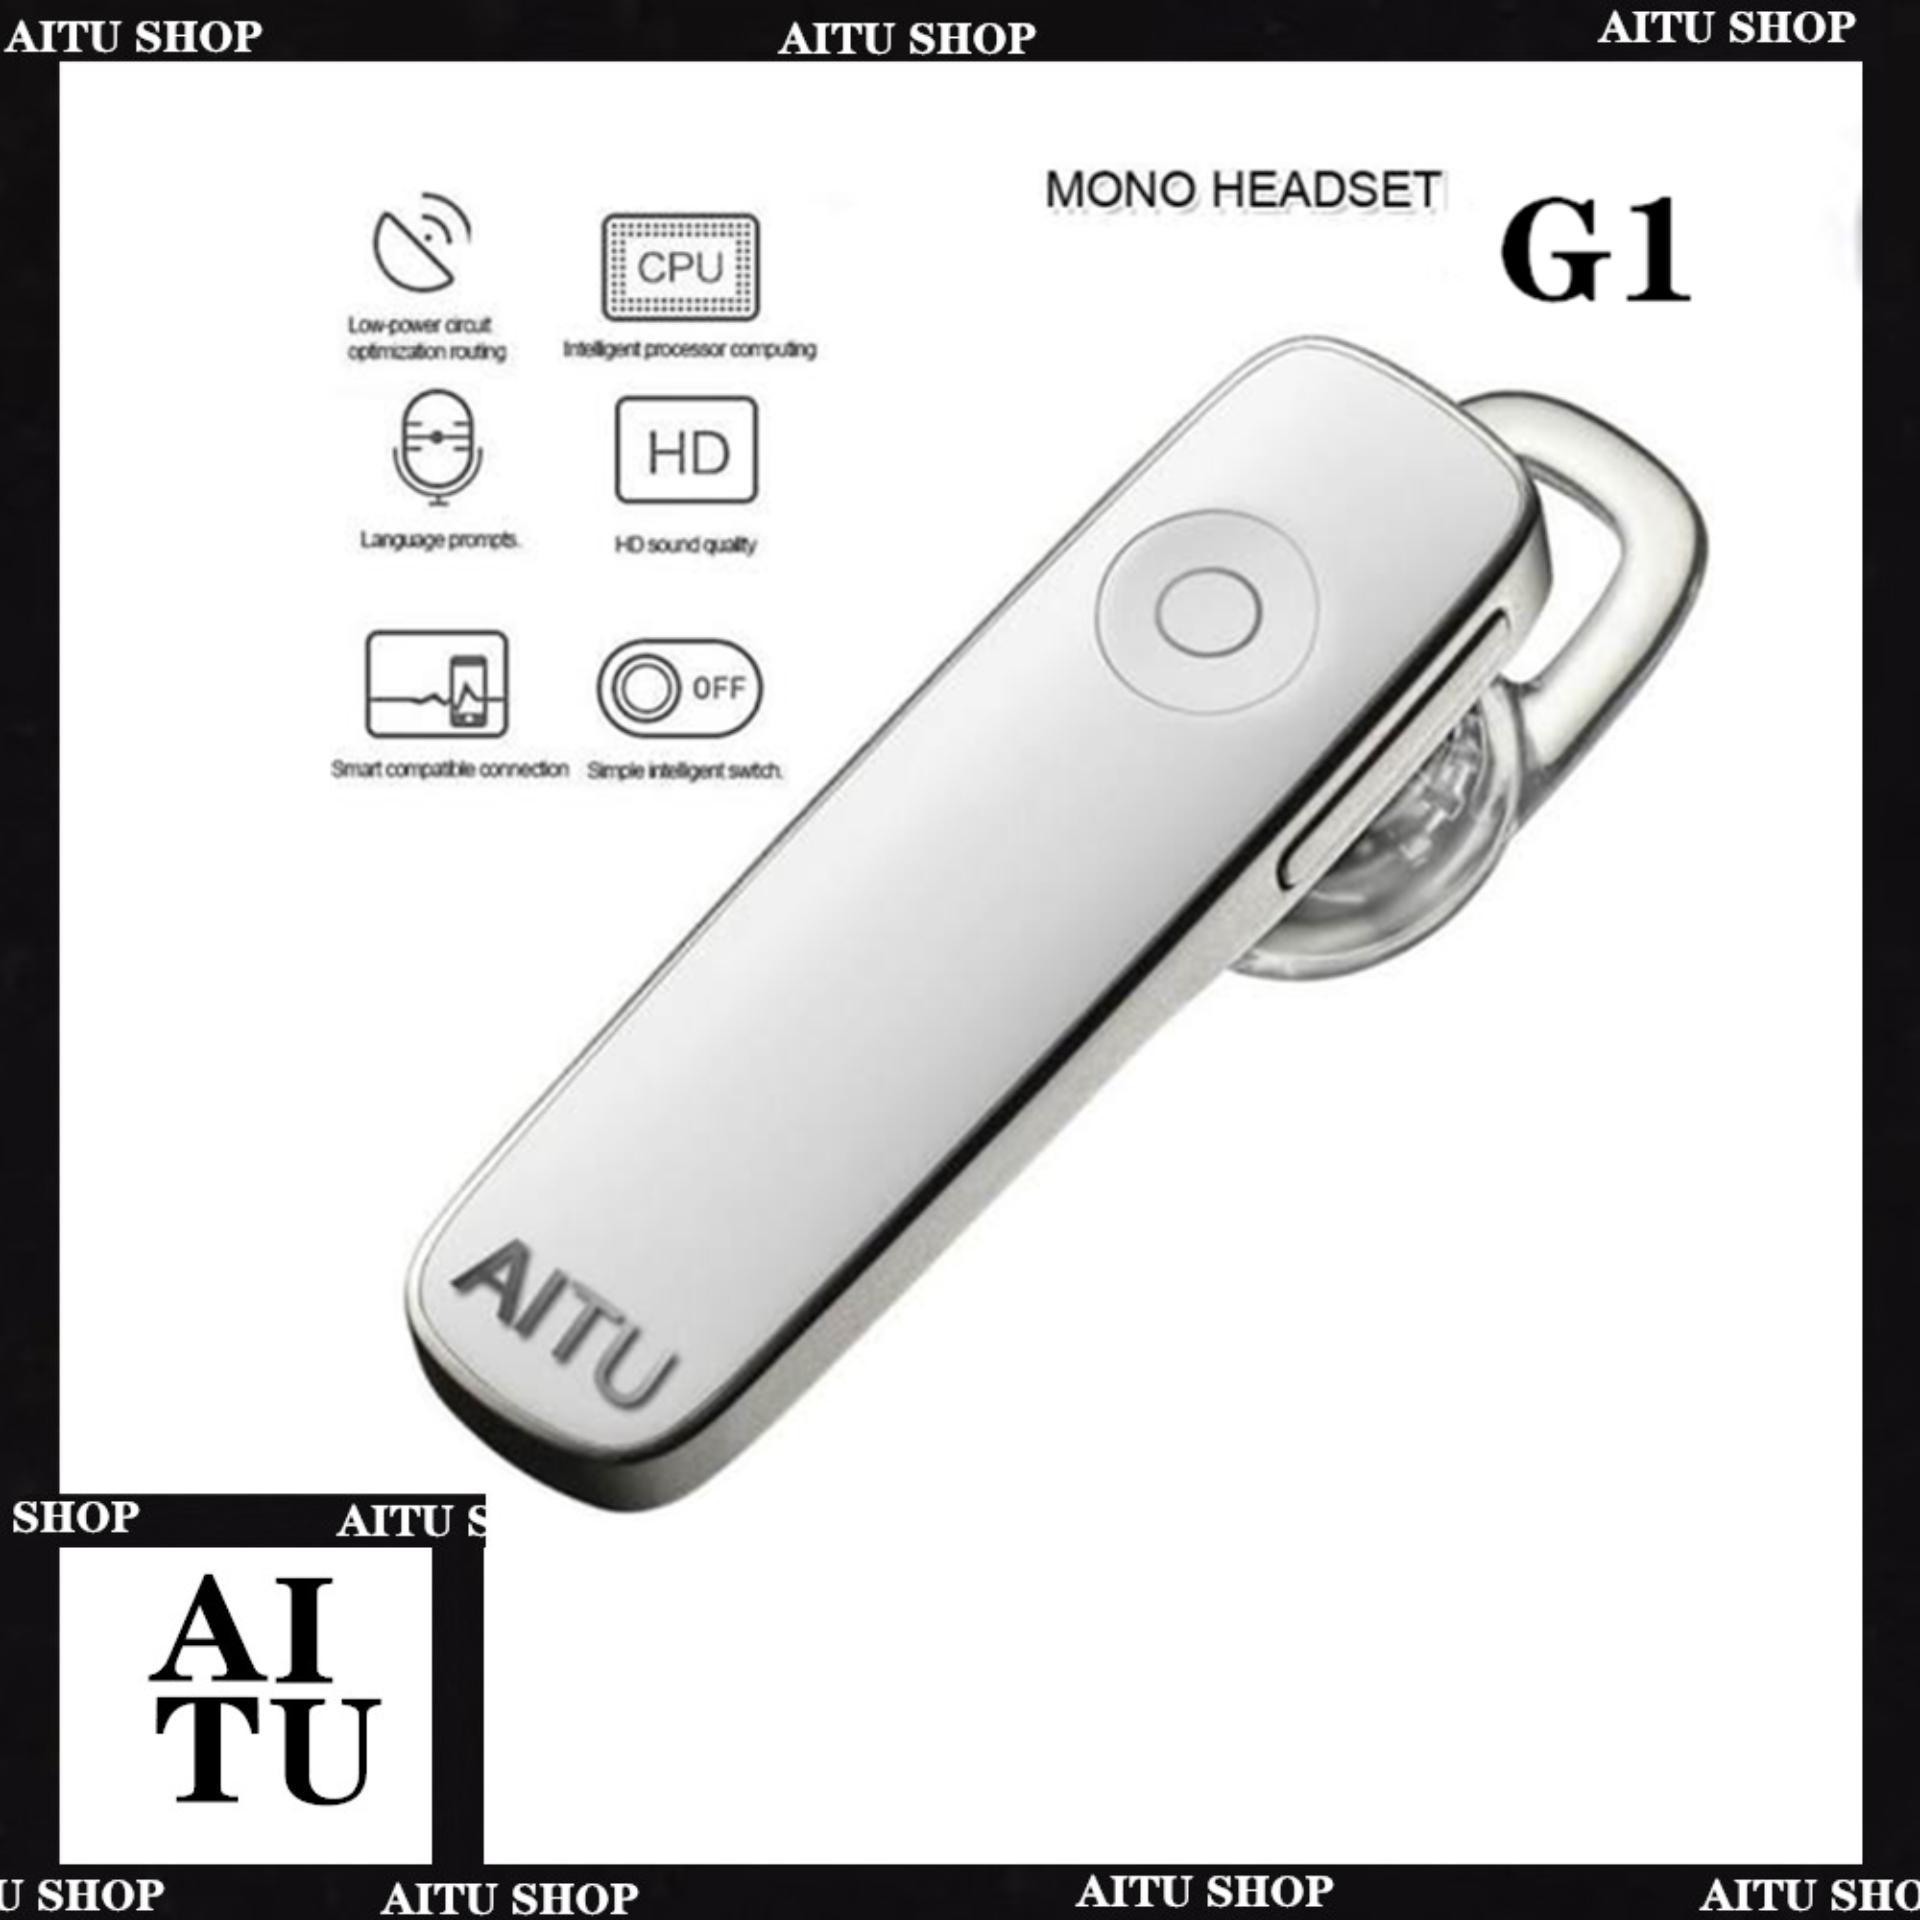 AITU G1 Wireless Bluetooth Headset Headset BT V4 0 Stereo Handsfree With  Microphone M165